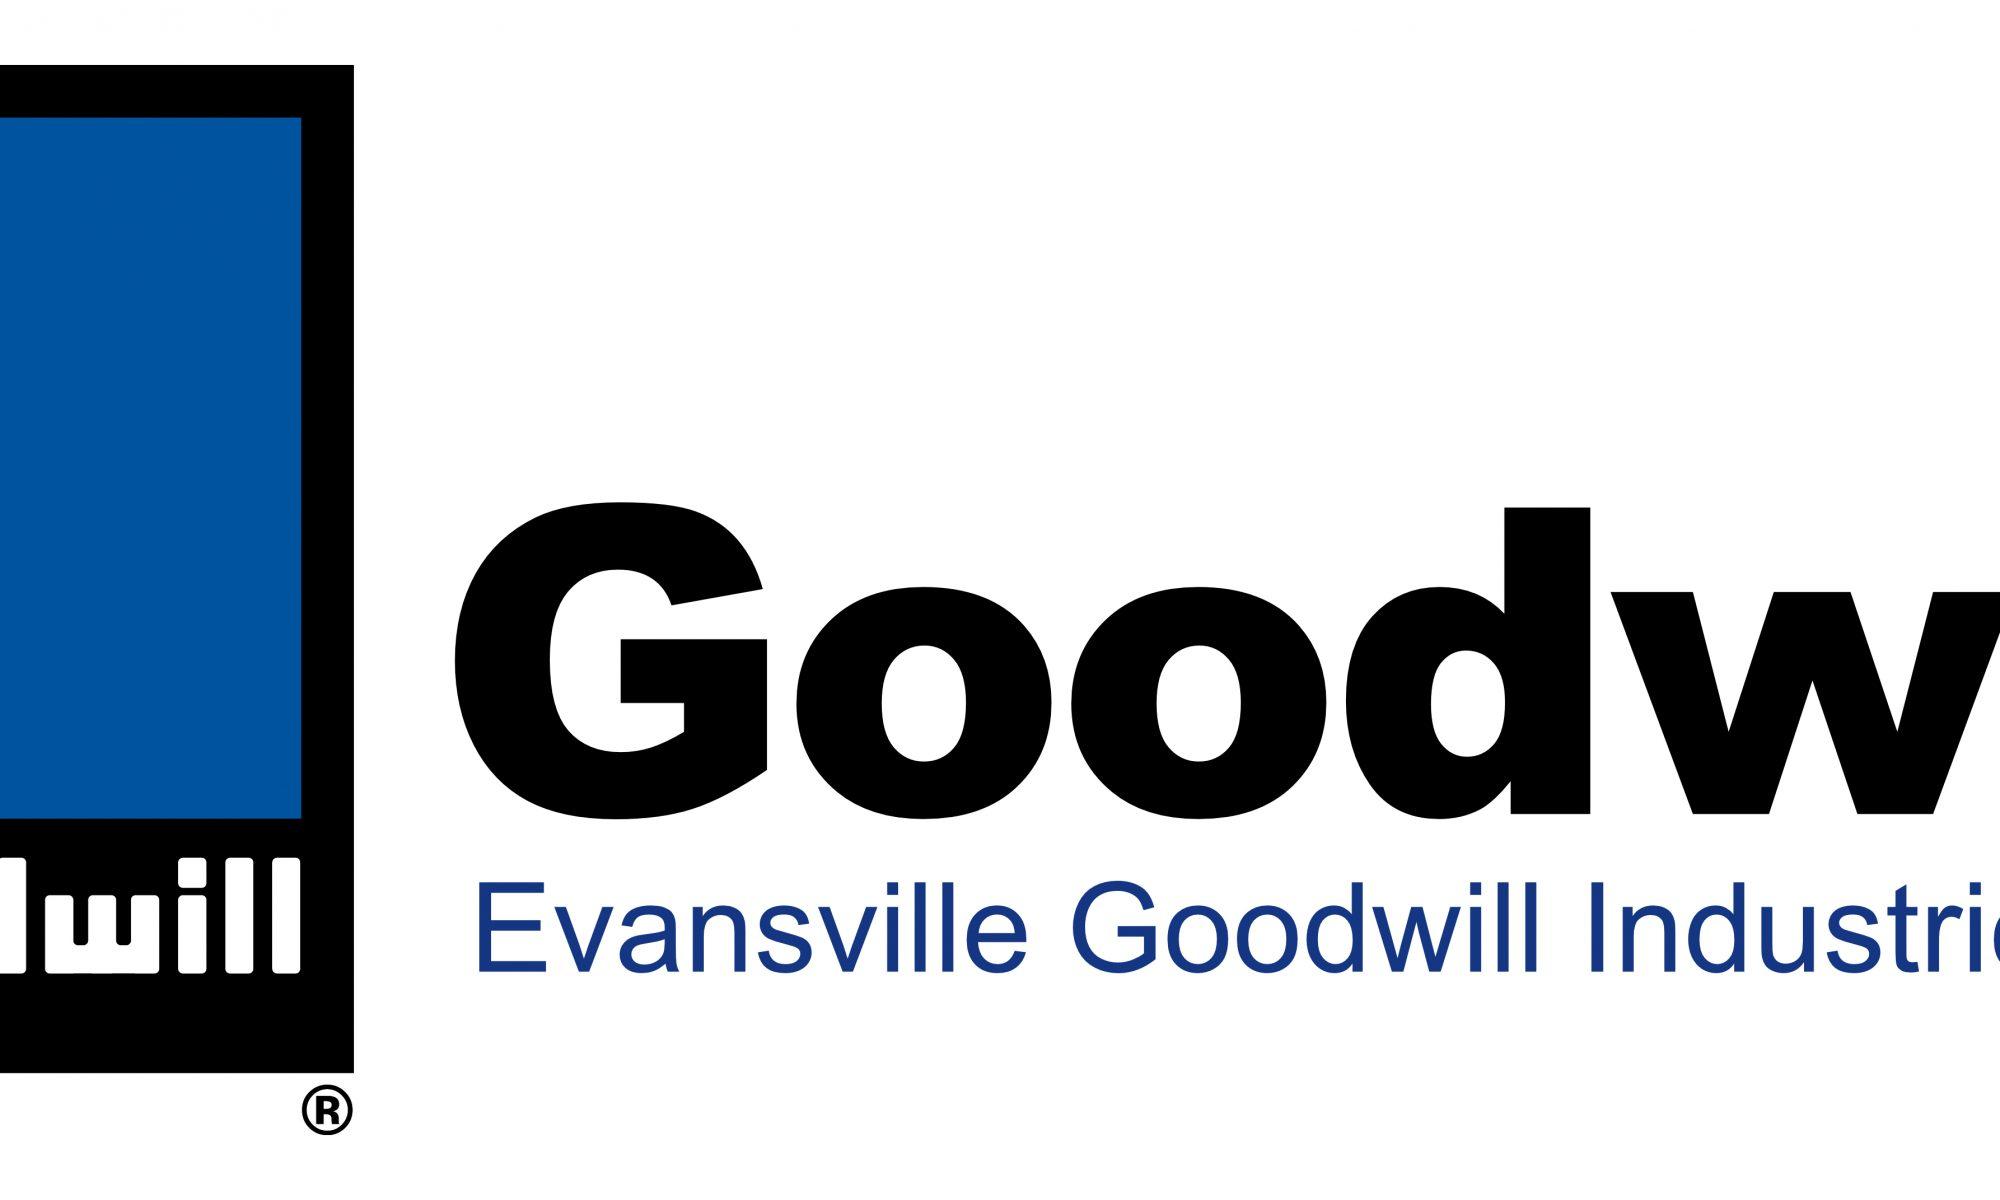 Evansville Goodwill Industries Logo